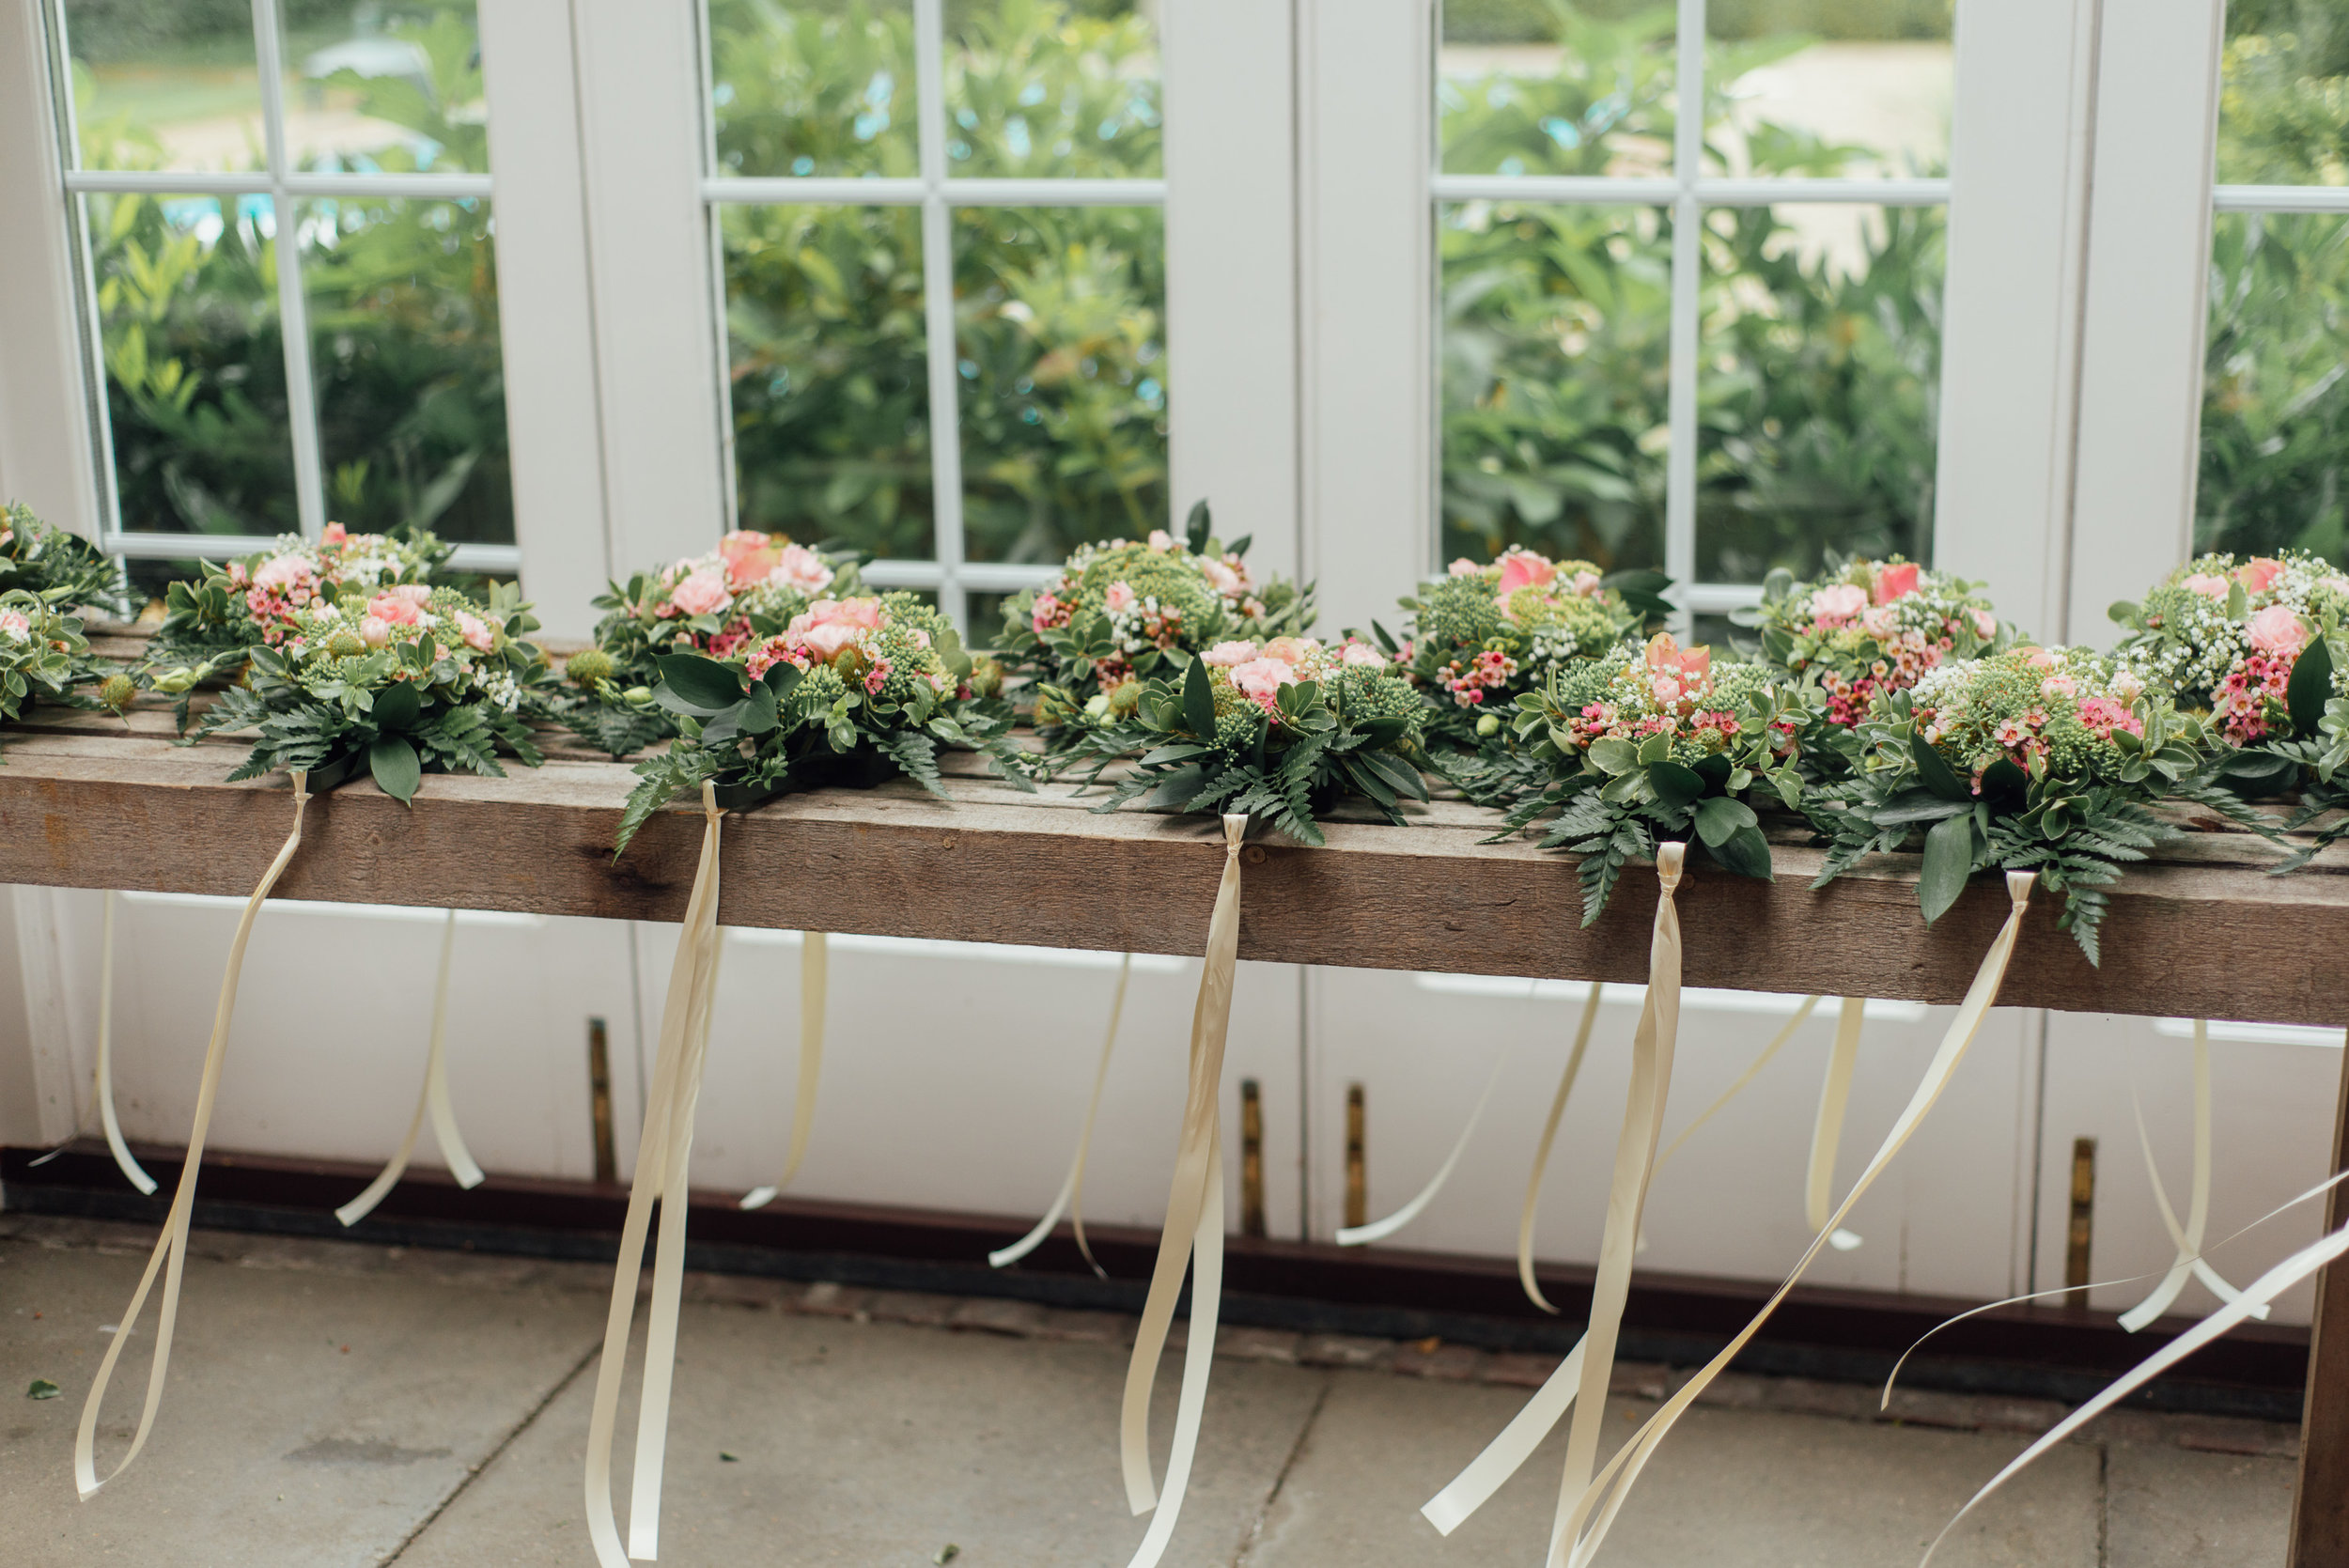 cleland-studios-wedding-photography-2.jpg